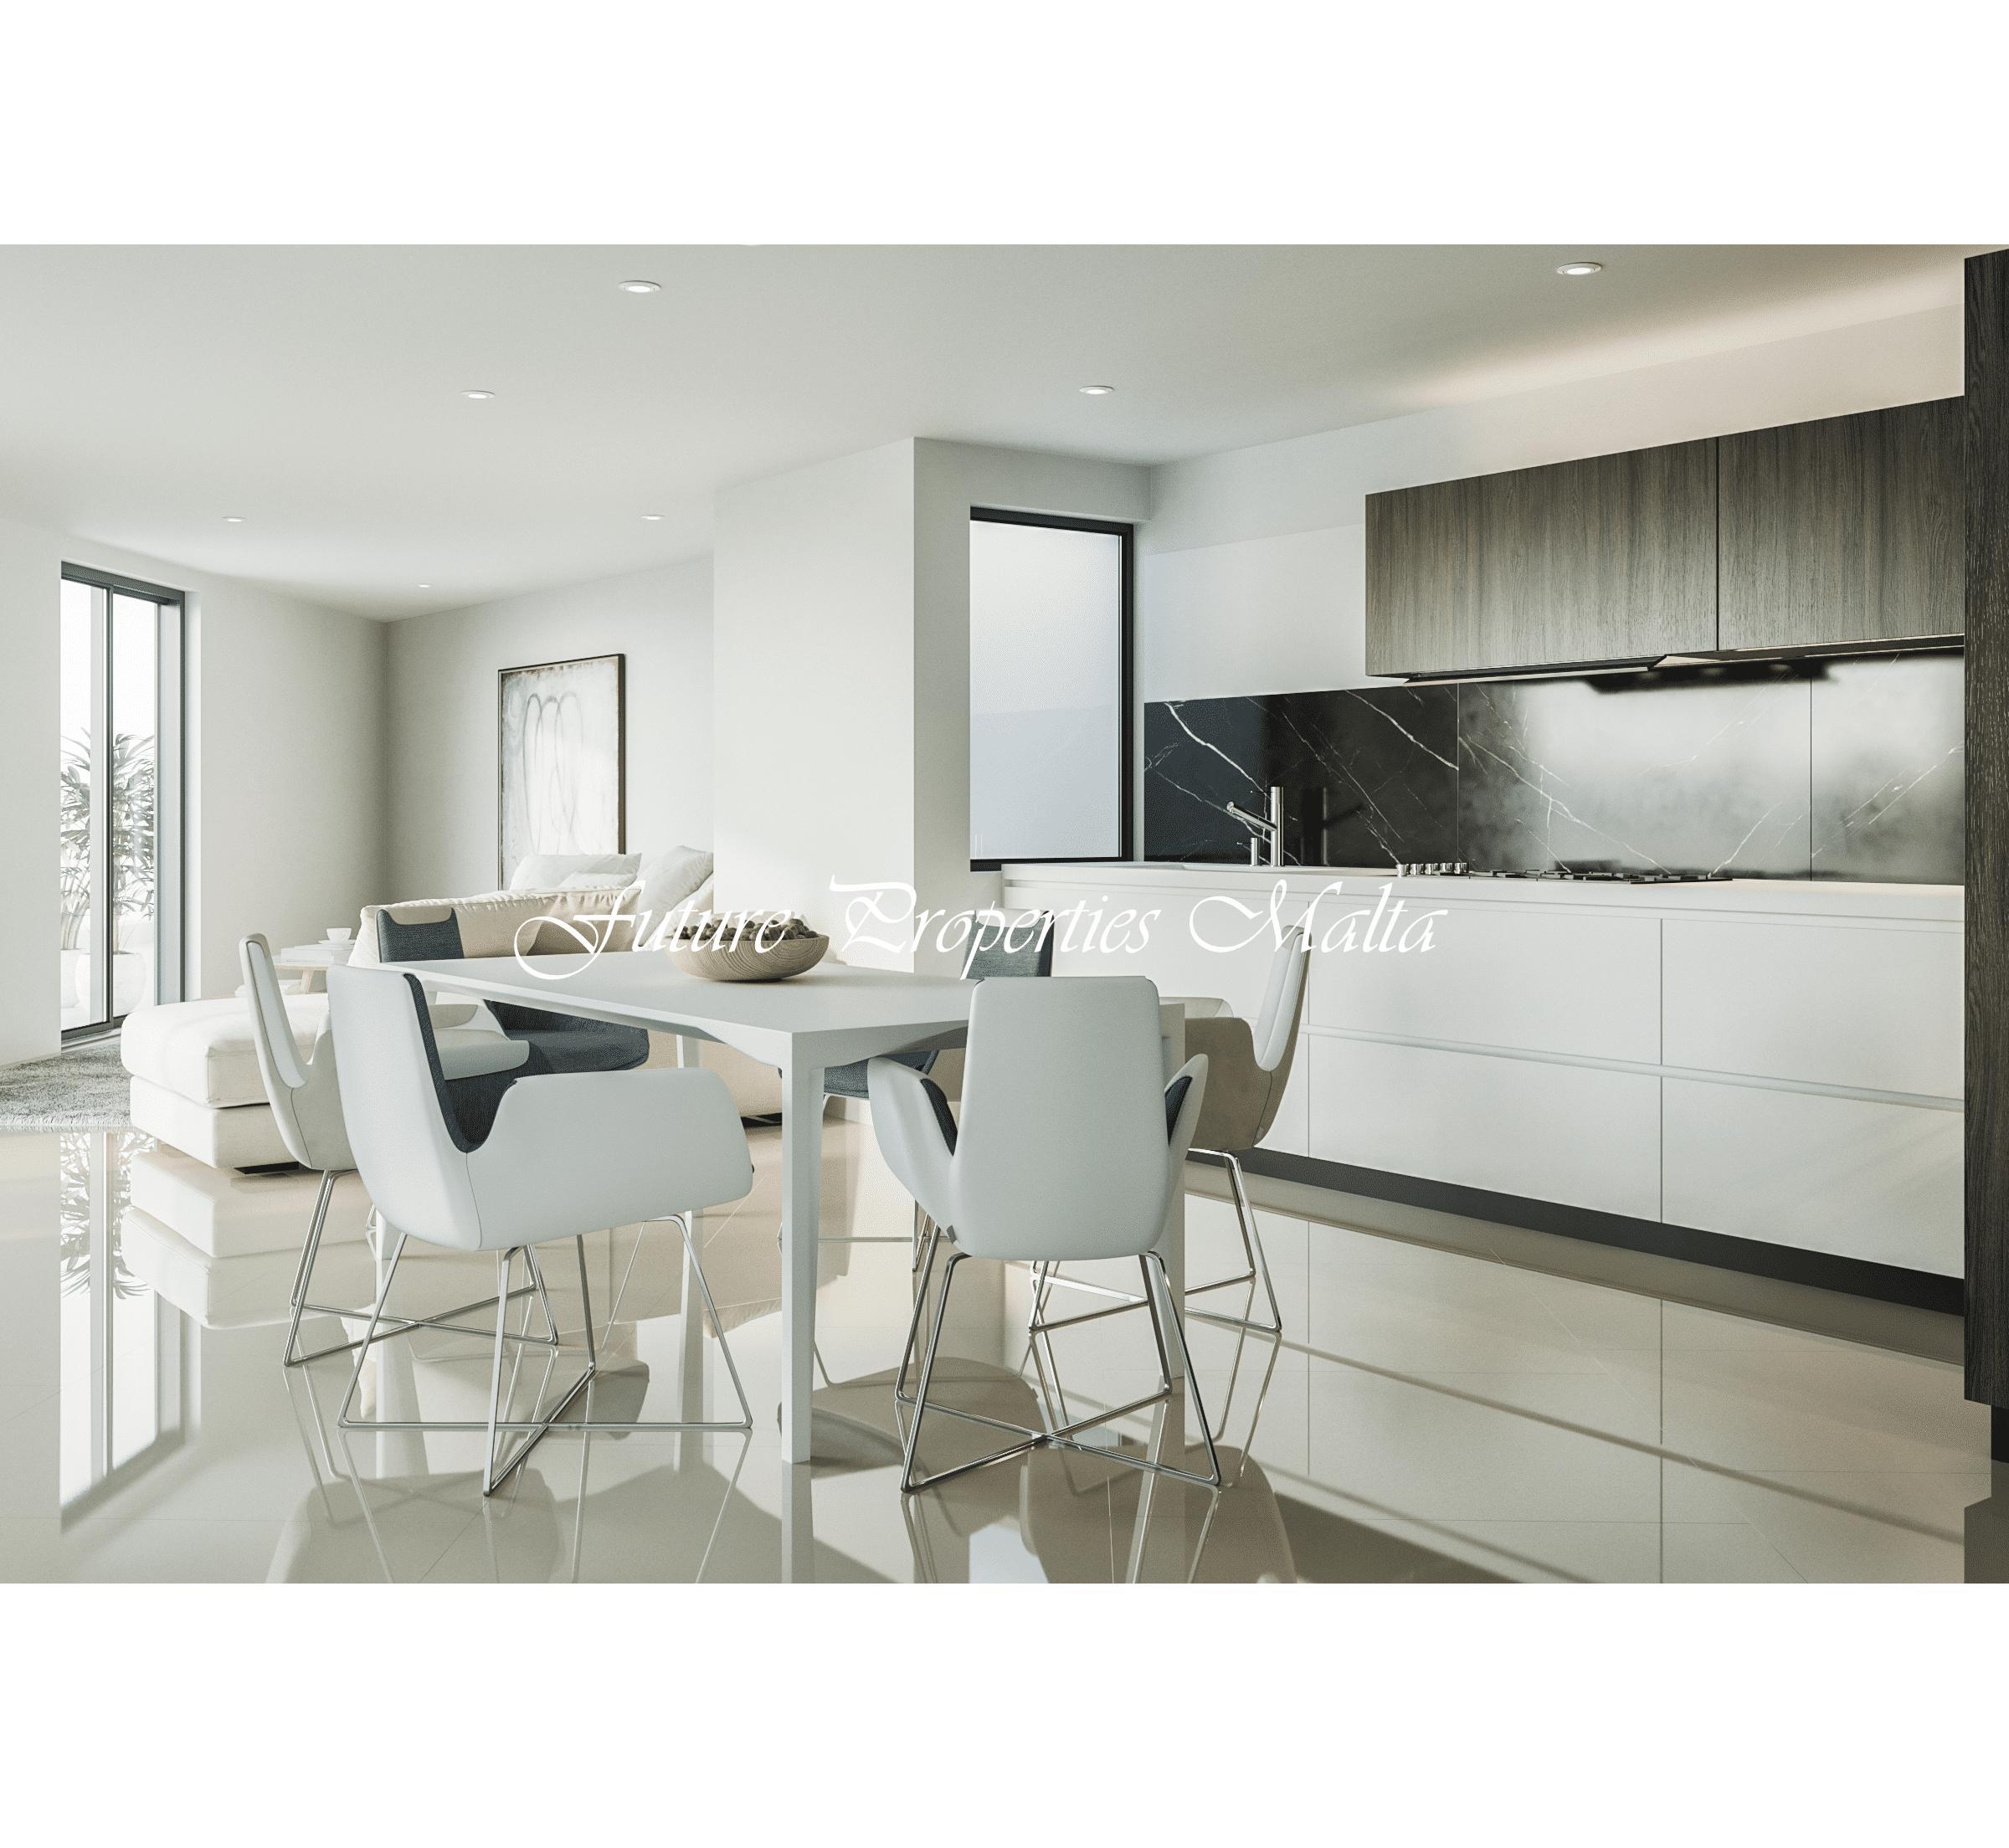 FPRO_interior_penthouse1-p1eac8720h17lltjchr1lik1hvs